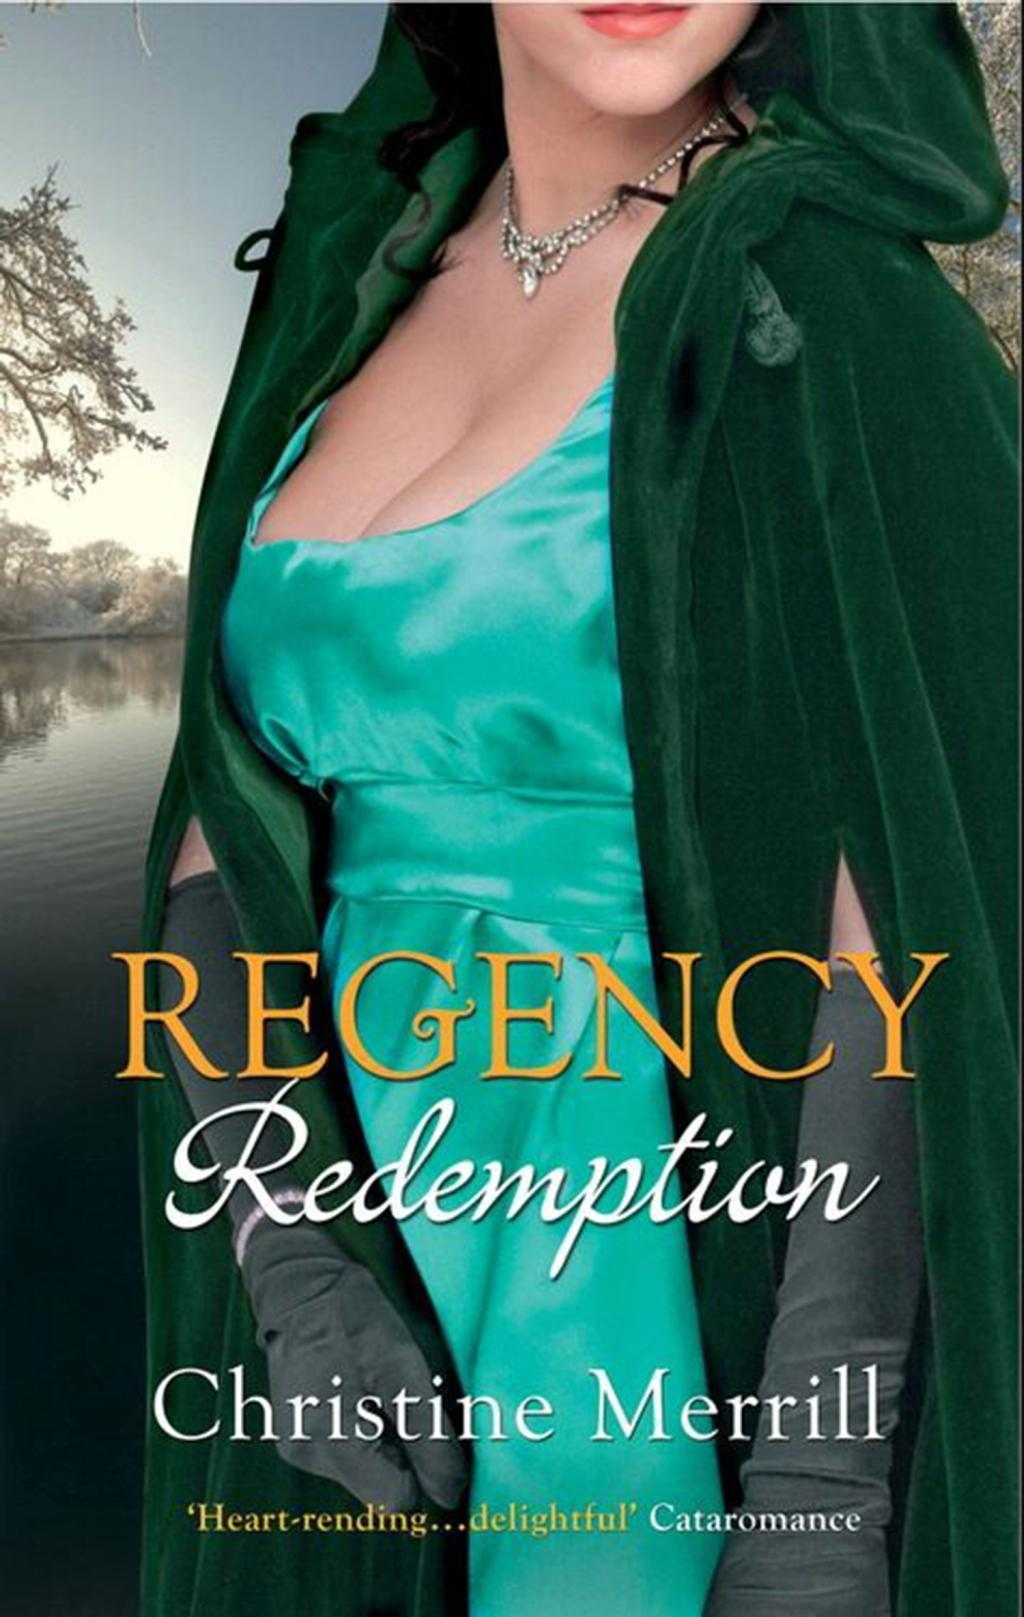 Regency Redemption: The Inconvenient Duchess / An Unladylike Offer (Mills & Boon M&B)